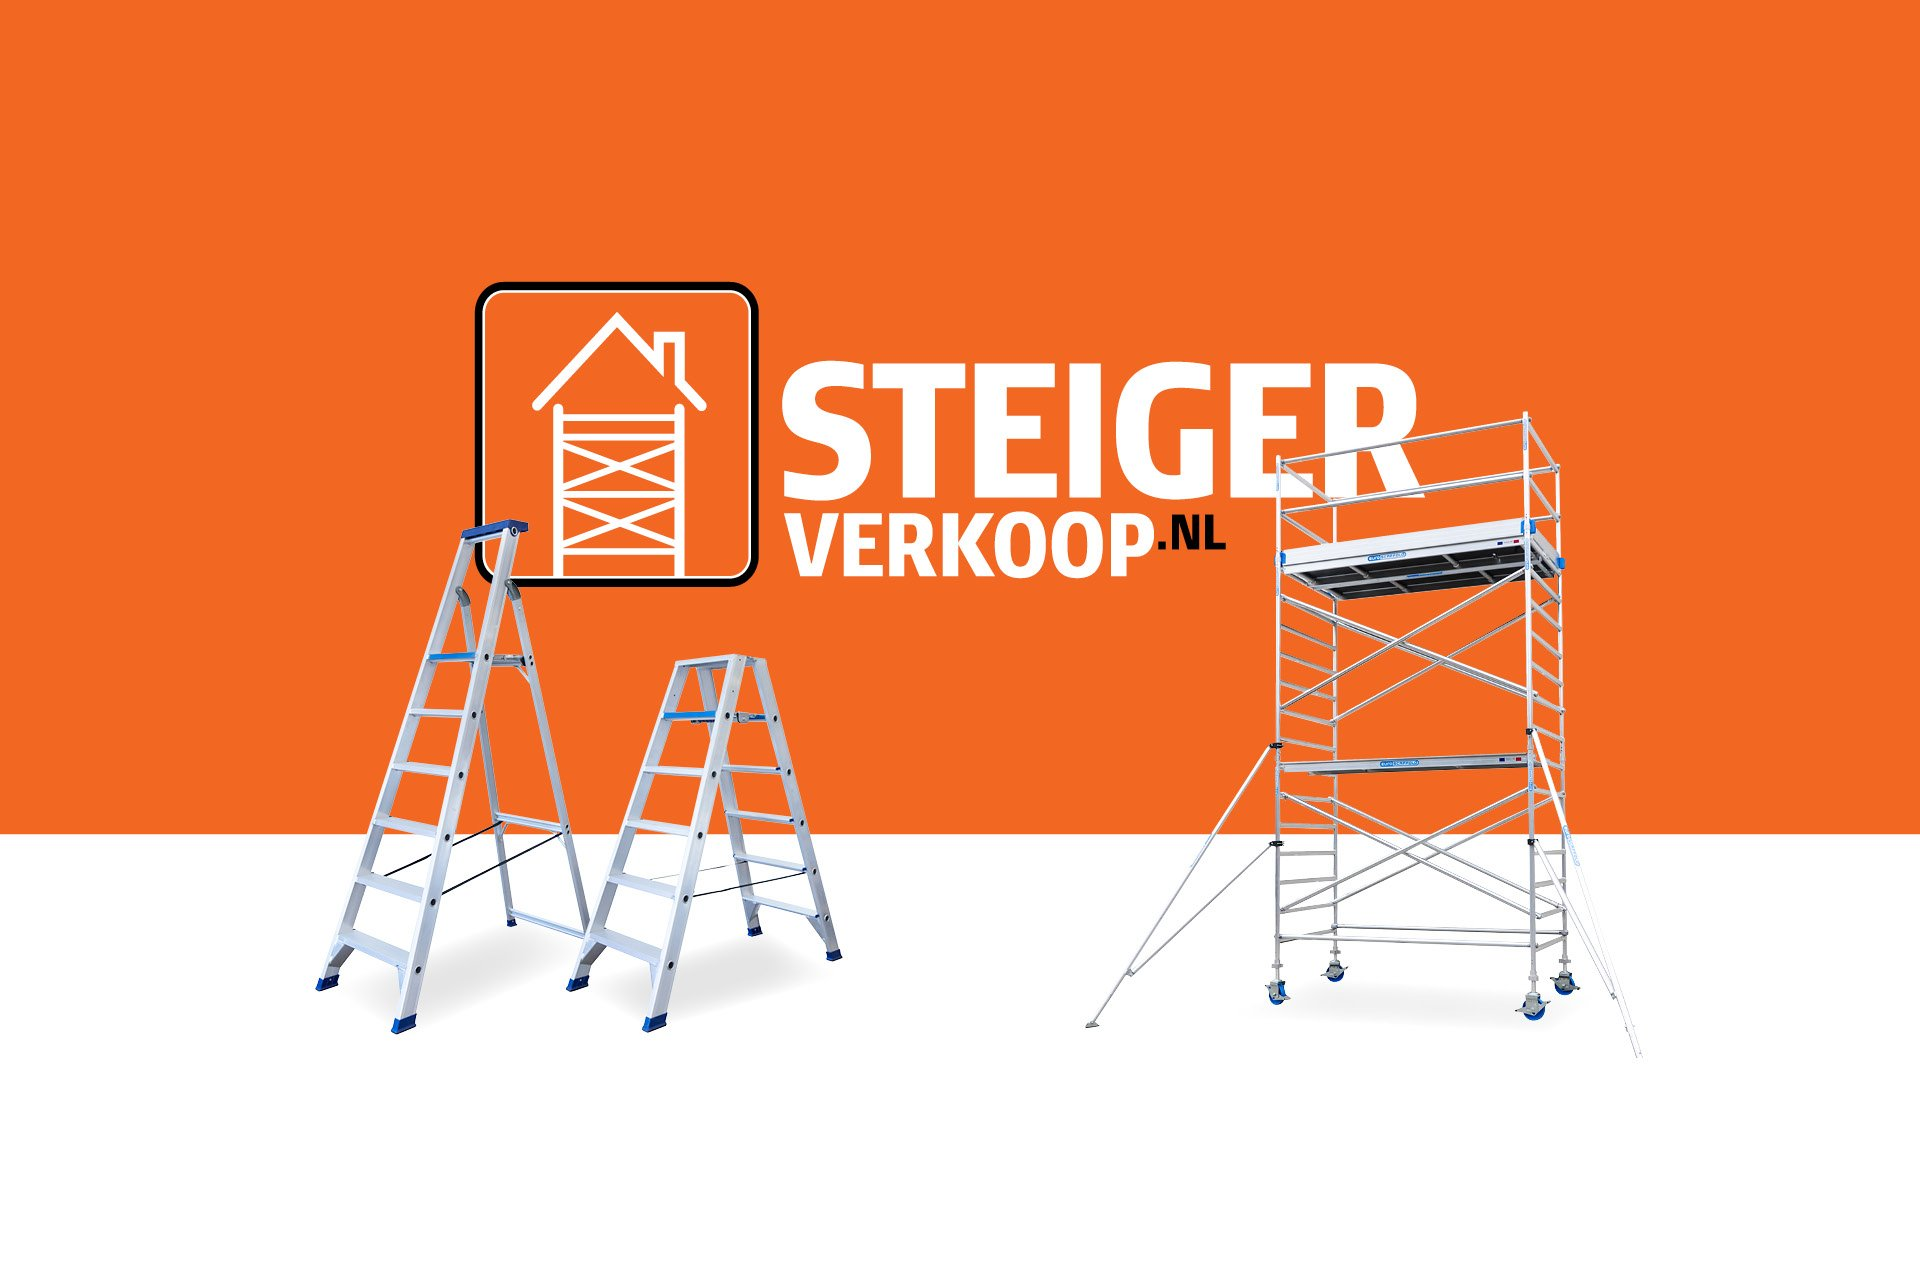 steigerverkoop.nl